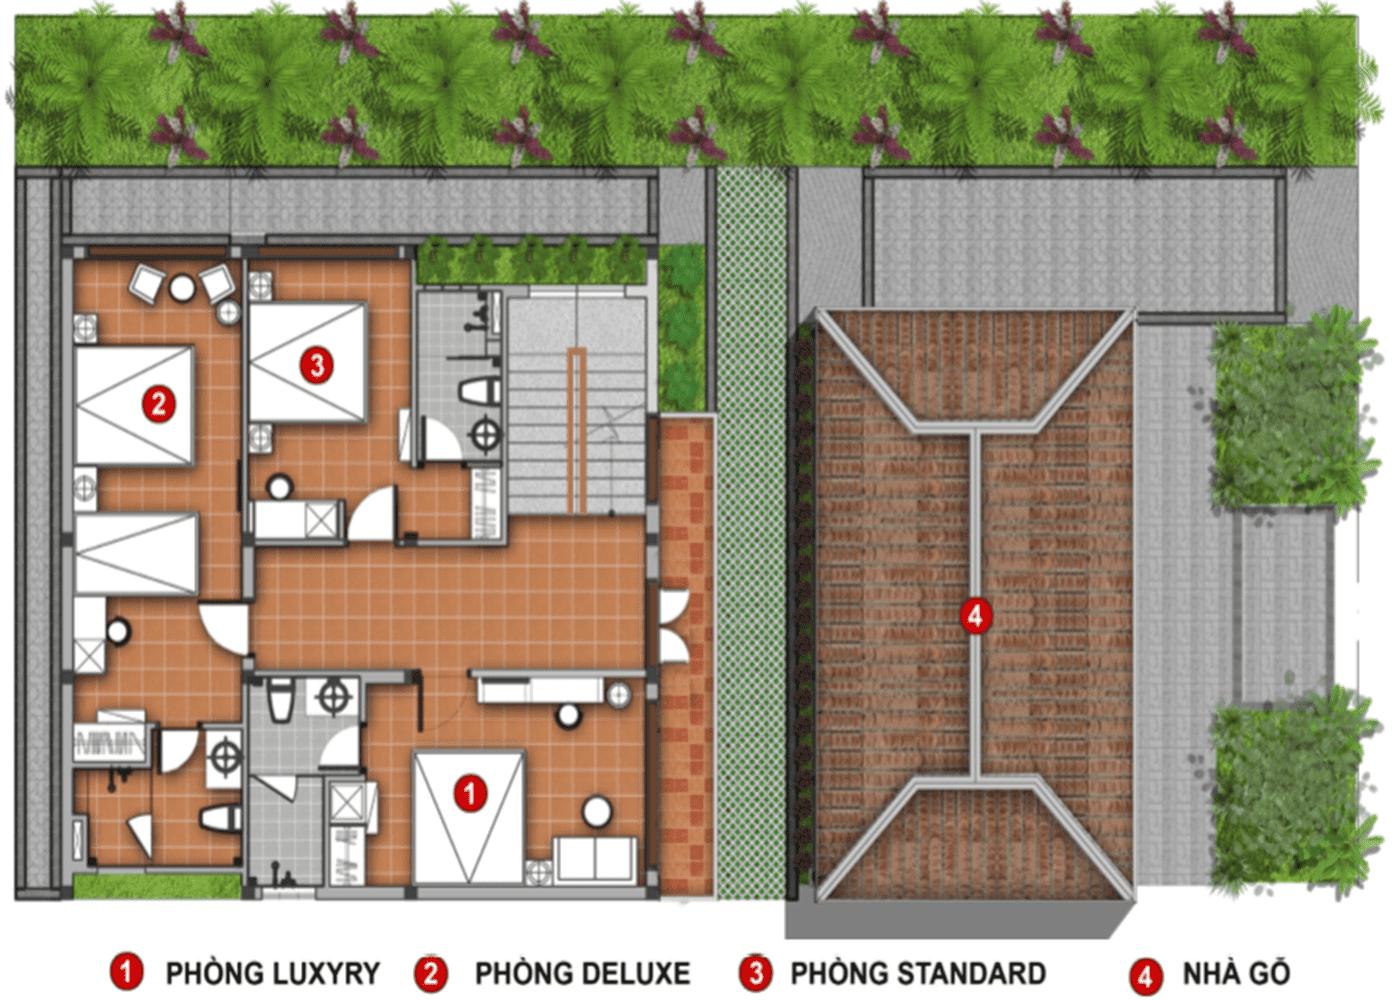 Mặt bằng lầu căn hộ Villa